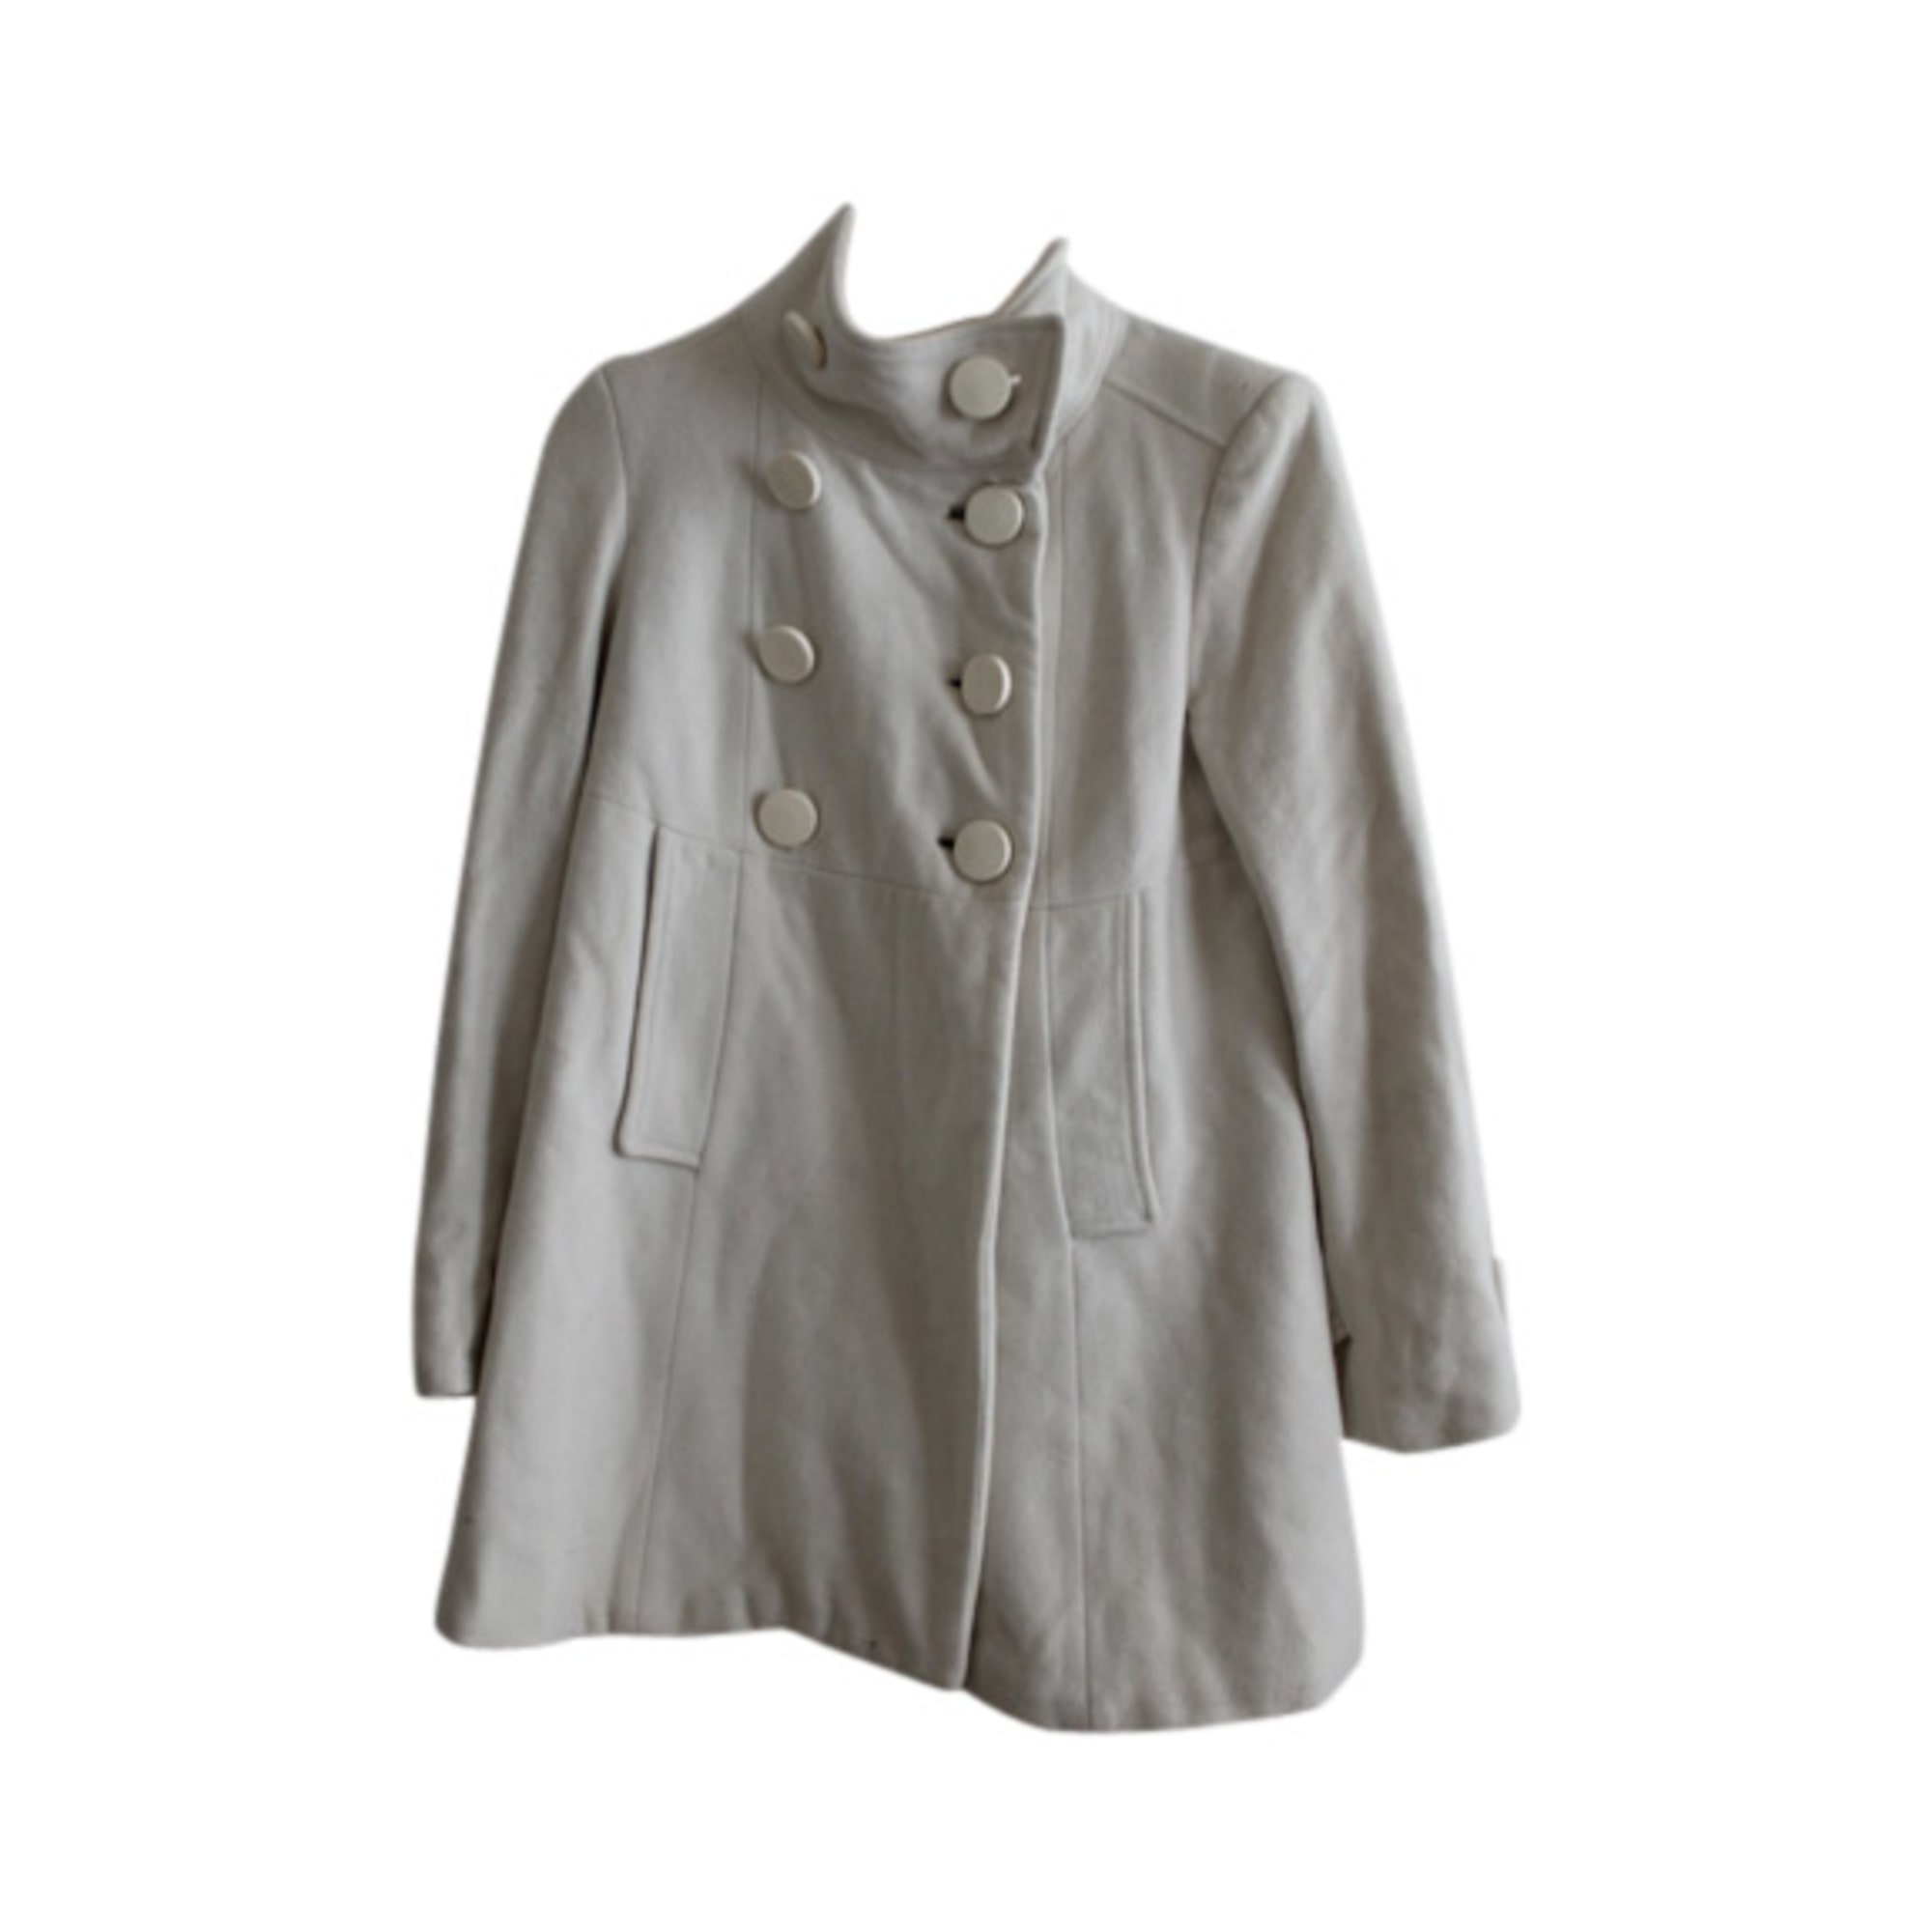 T1 Blanc s 2930020 36 Manteau Zara qEAxIqt